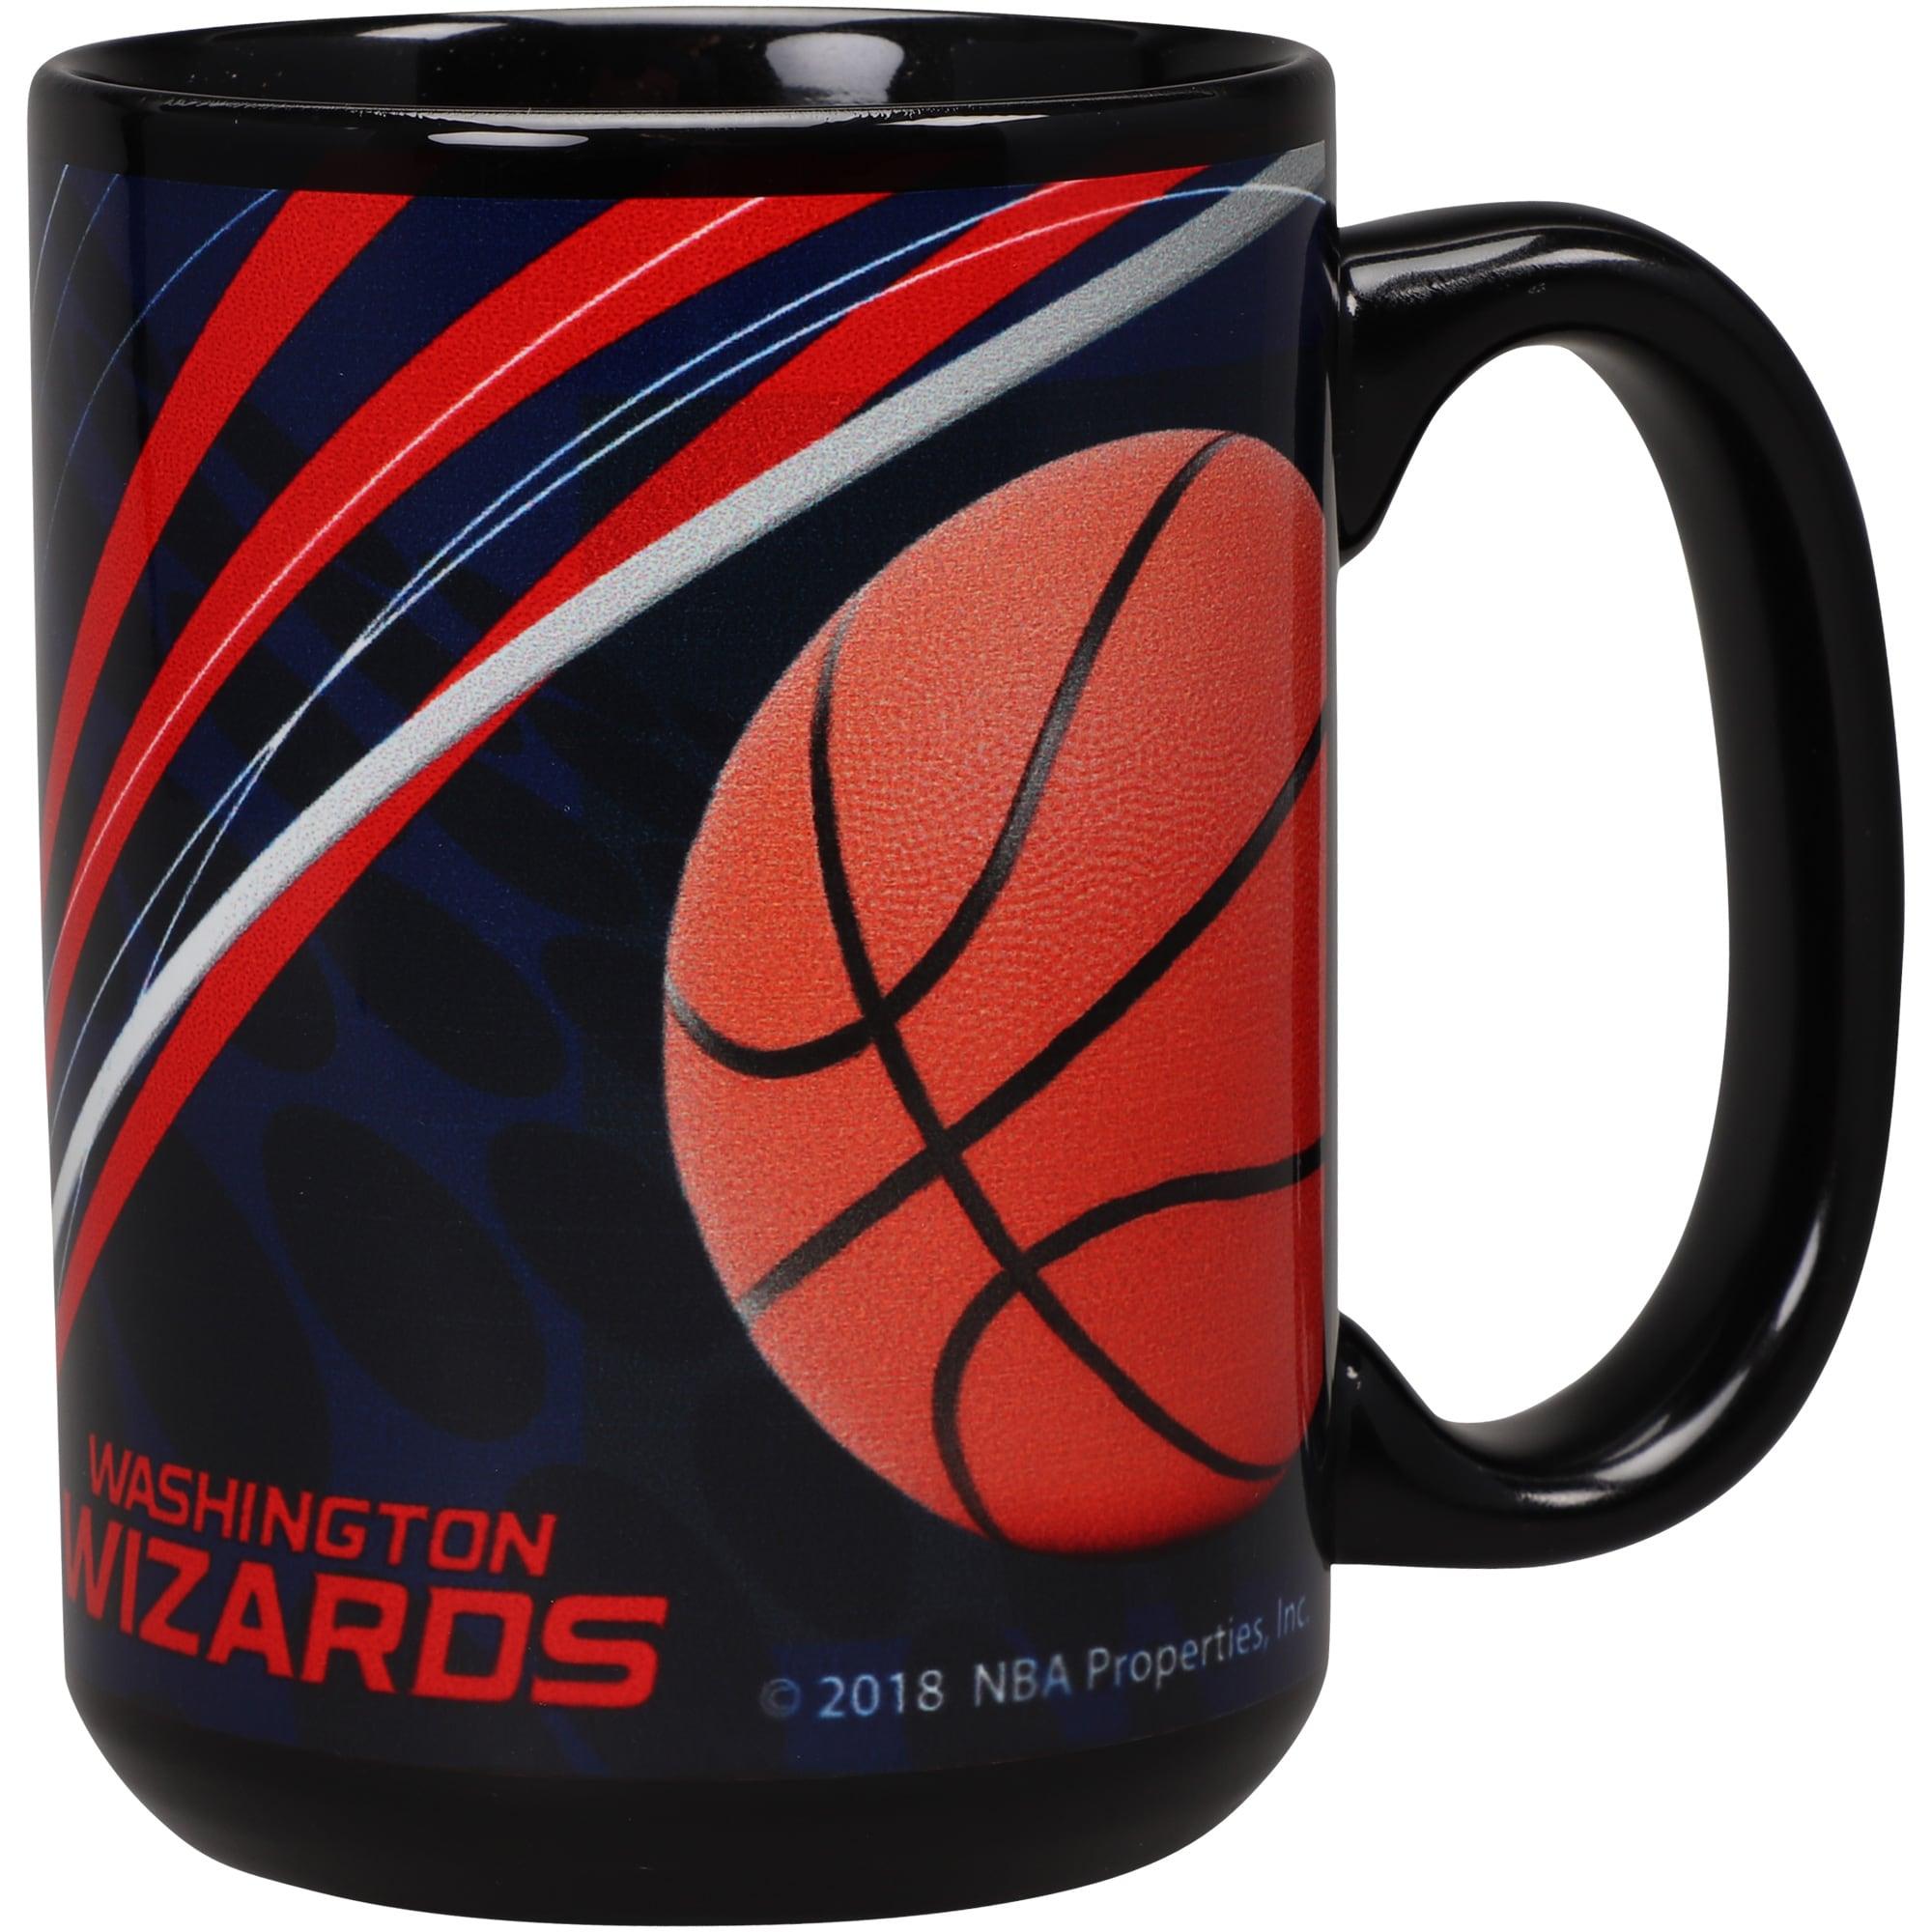 Washington Wizards 15oz. Dynamic Mug